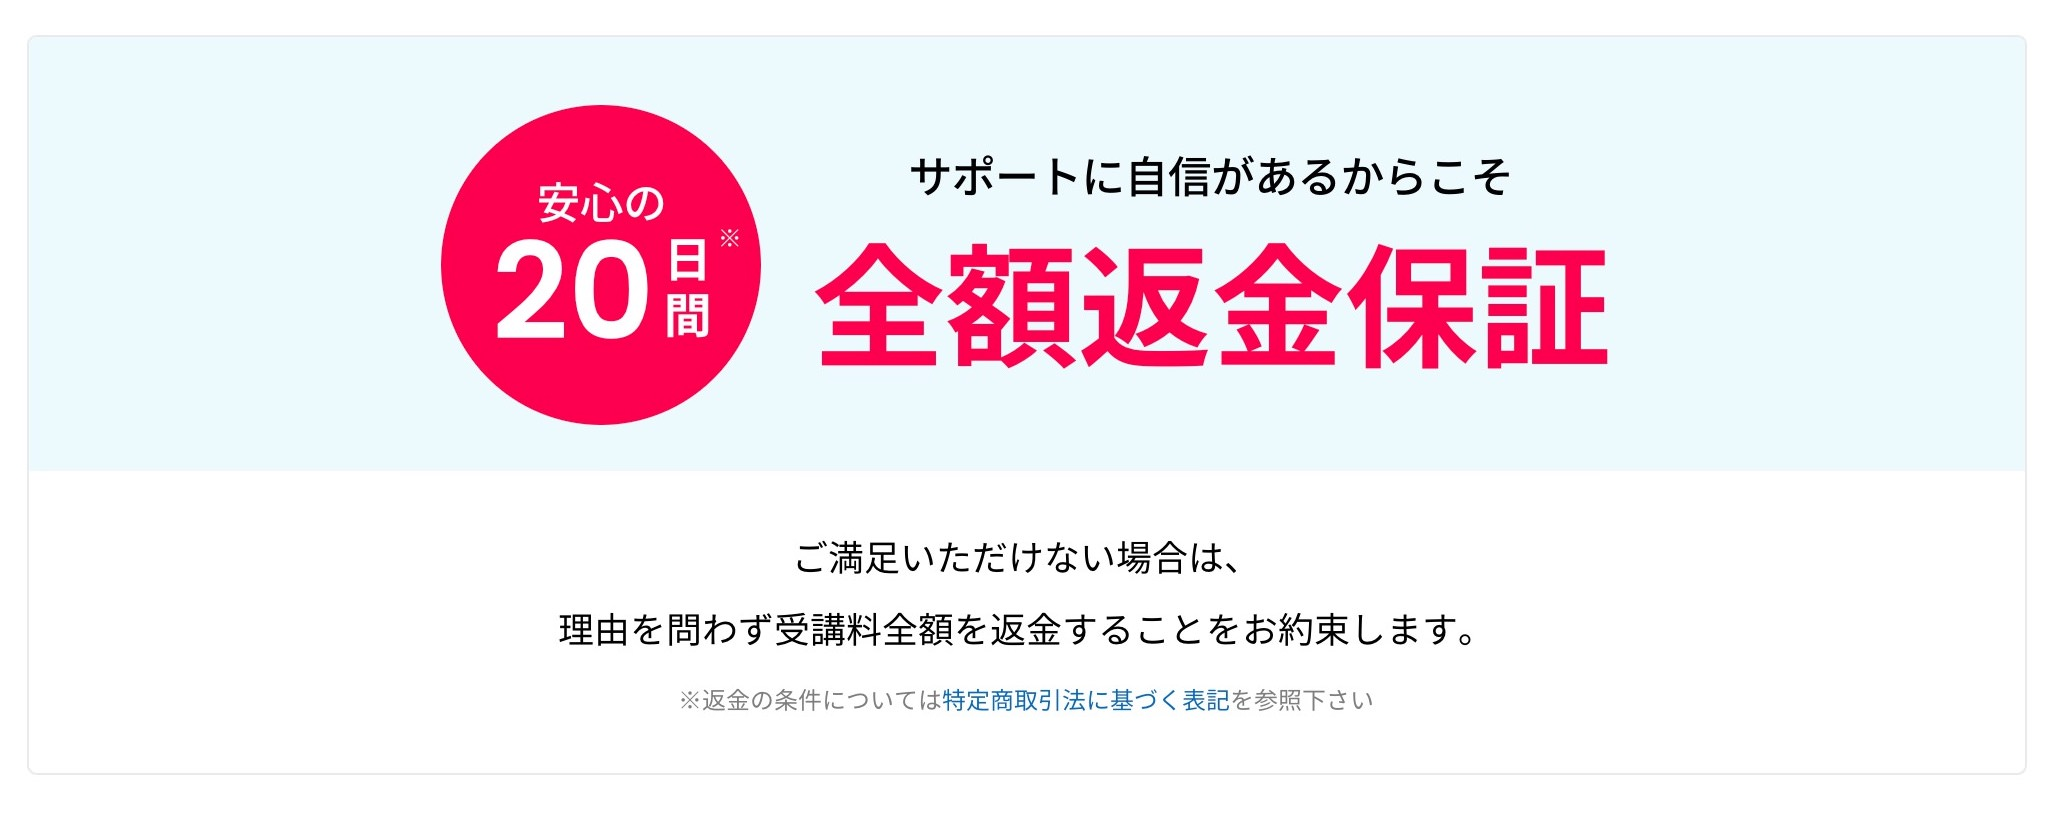 DMM WEBCAMP COMMITの全額返金保証